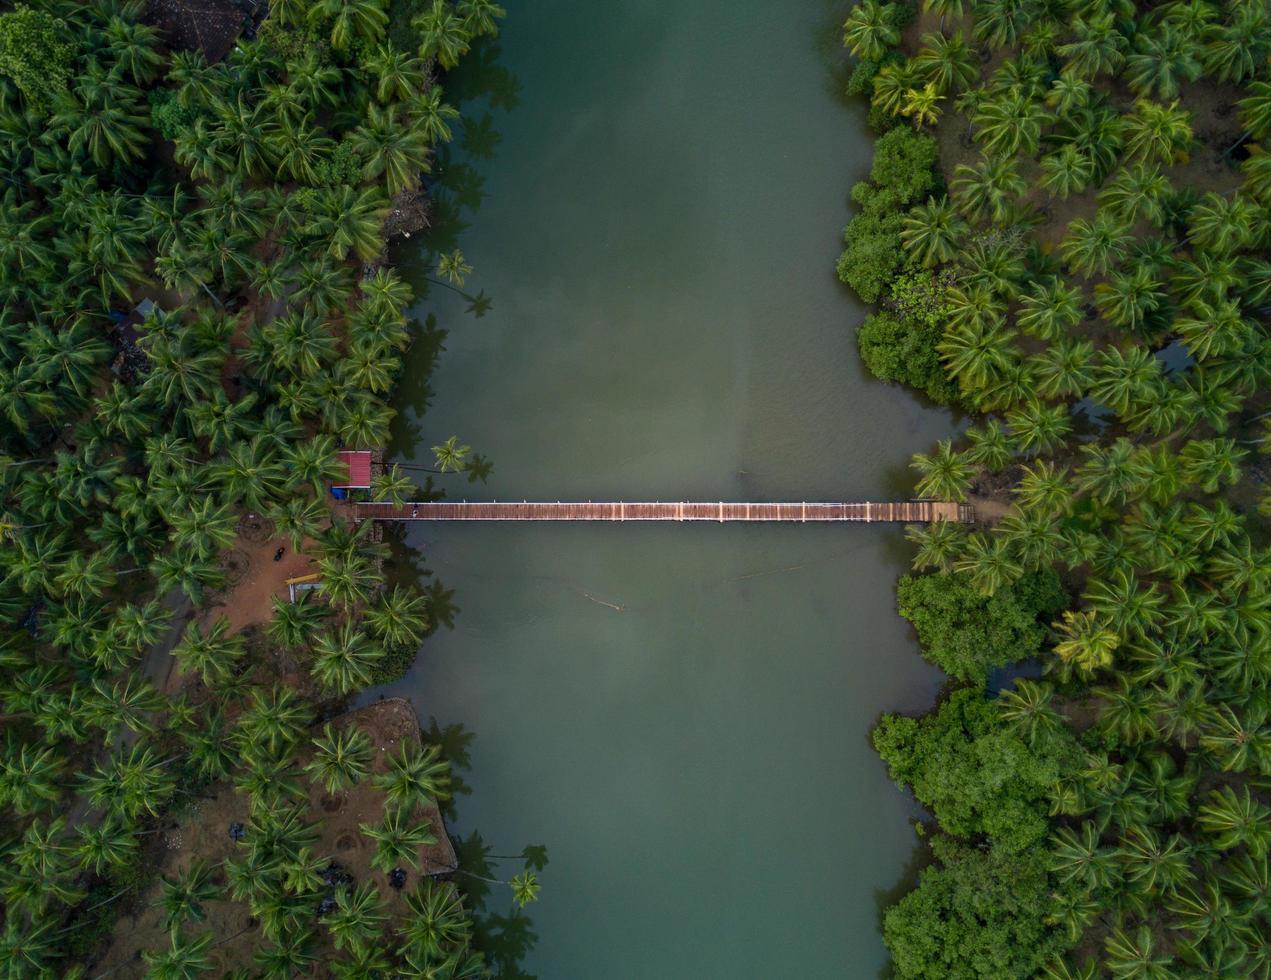 vista aerea sul ponte foto